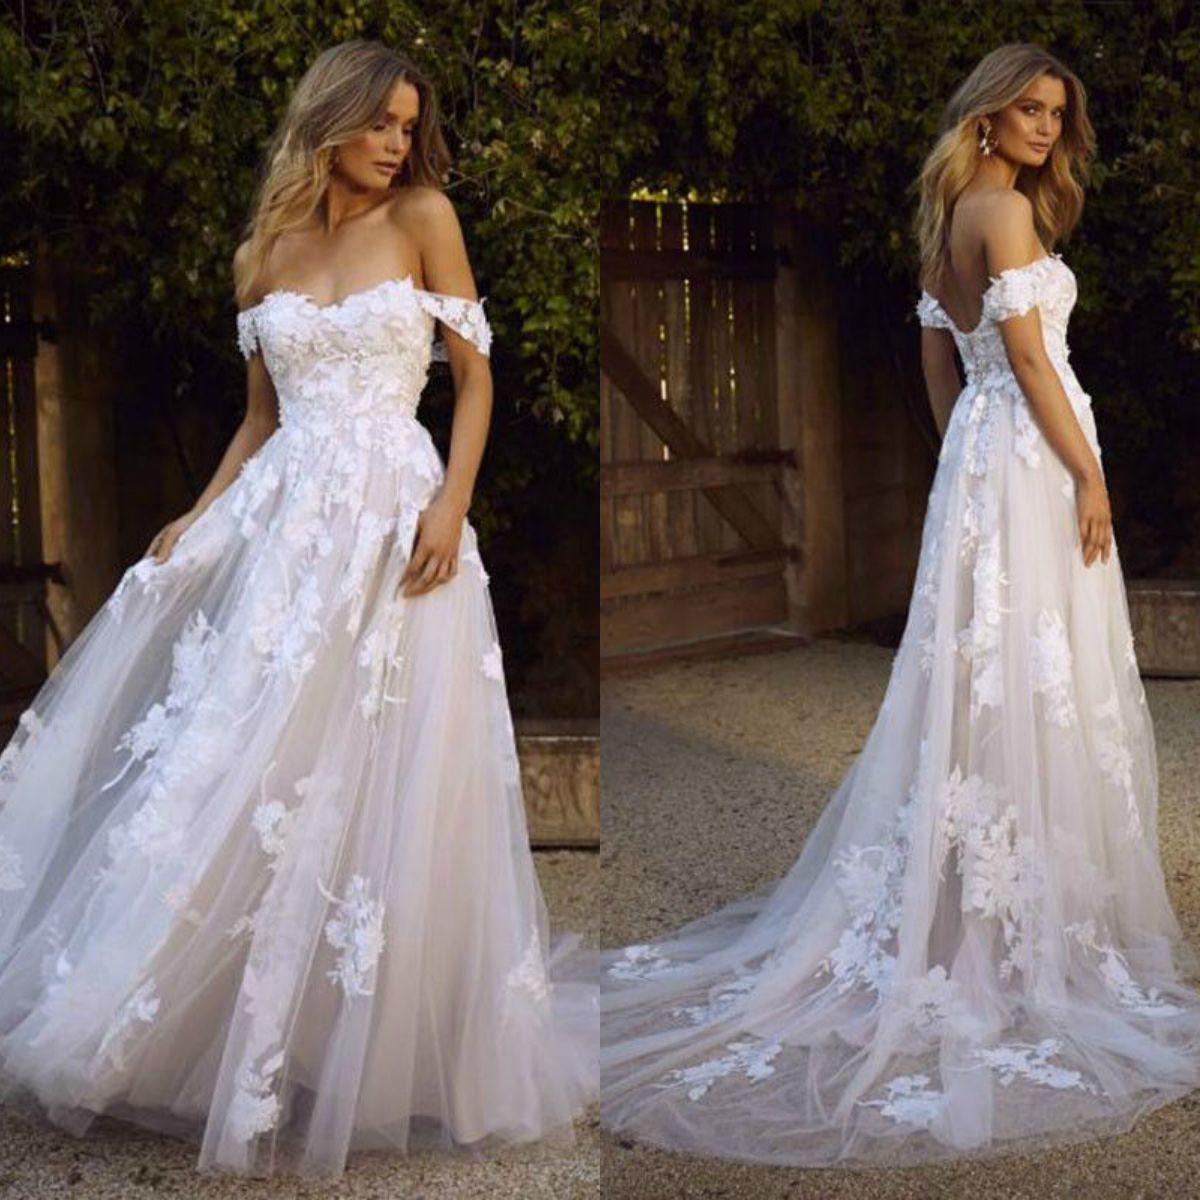 95612f472d07 Discount Berta 2019 A Line Beach Wedding Dresses Bohemia Lace Appliqued Off  The Shoulder Wedding Gowns Backless Sexy Summer Beach Bridal Dress Short  Bridal ...